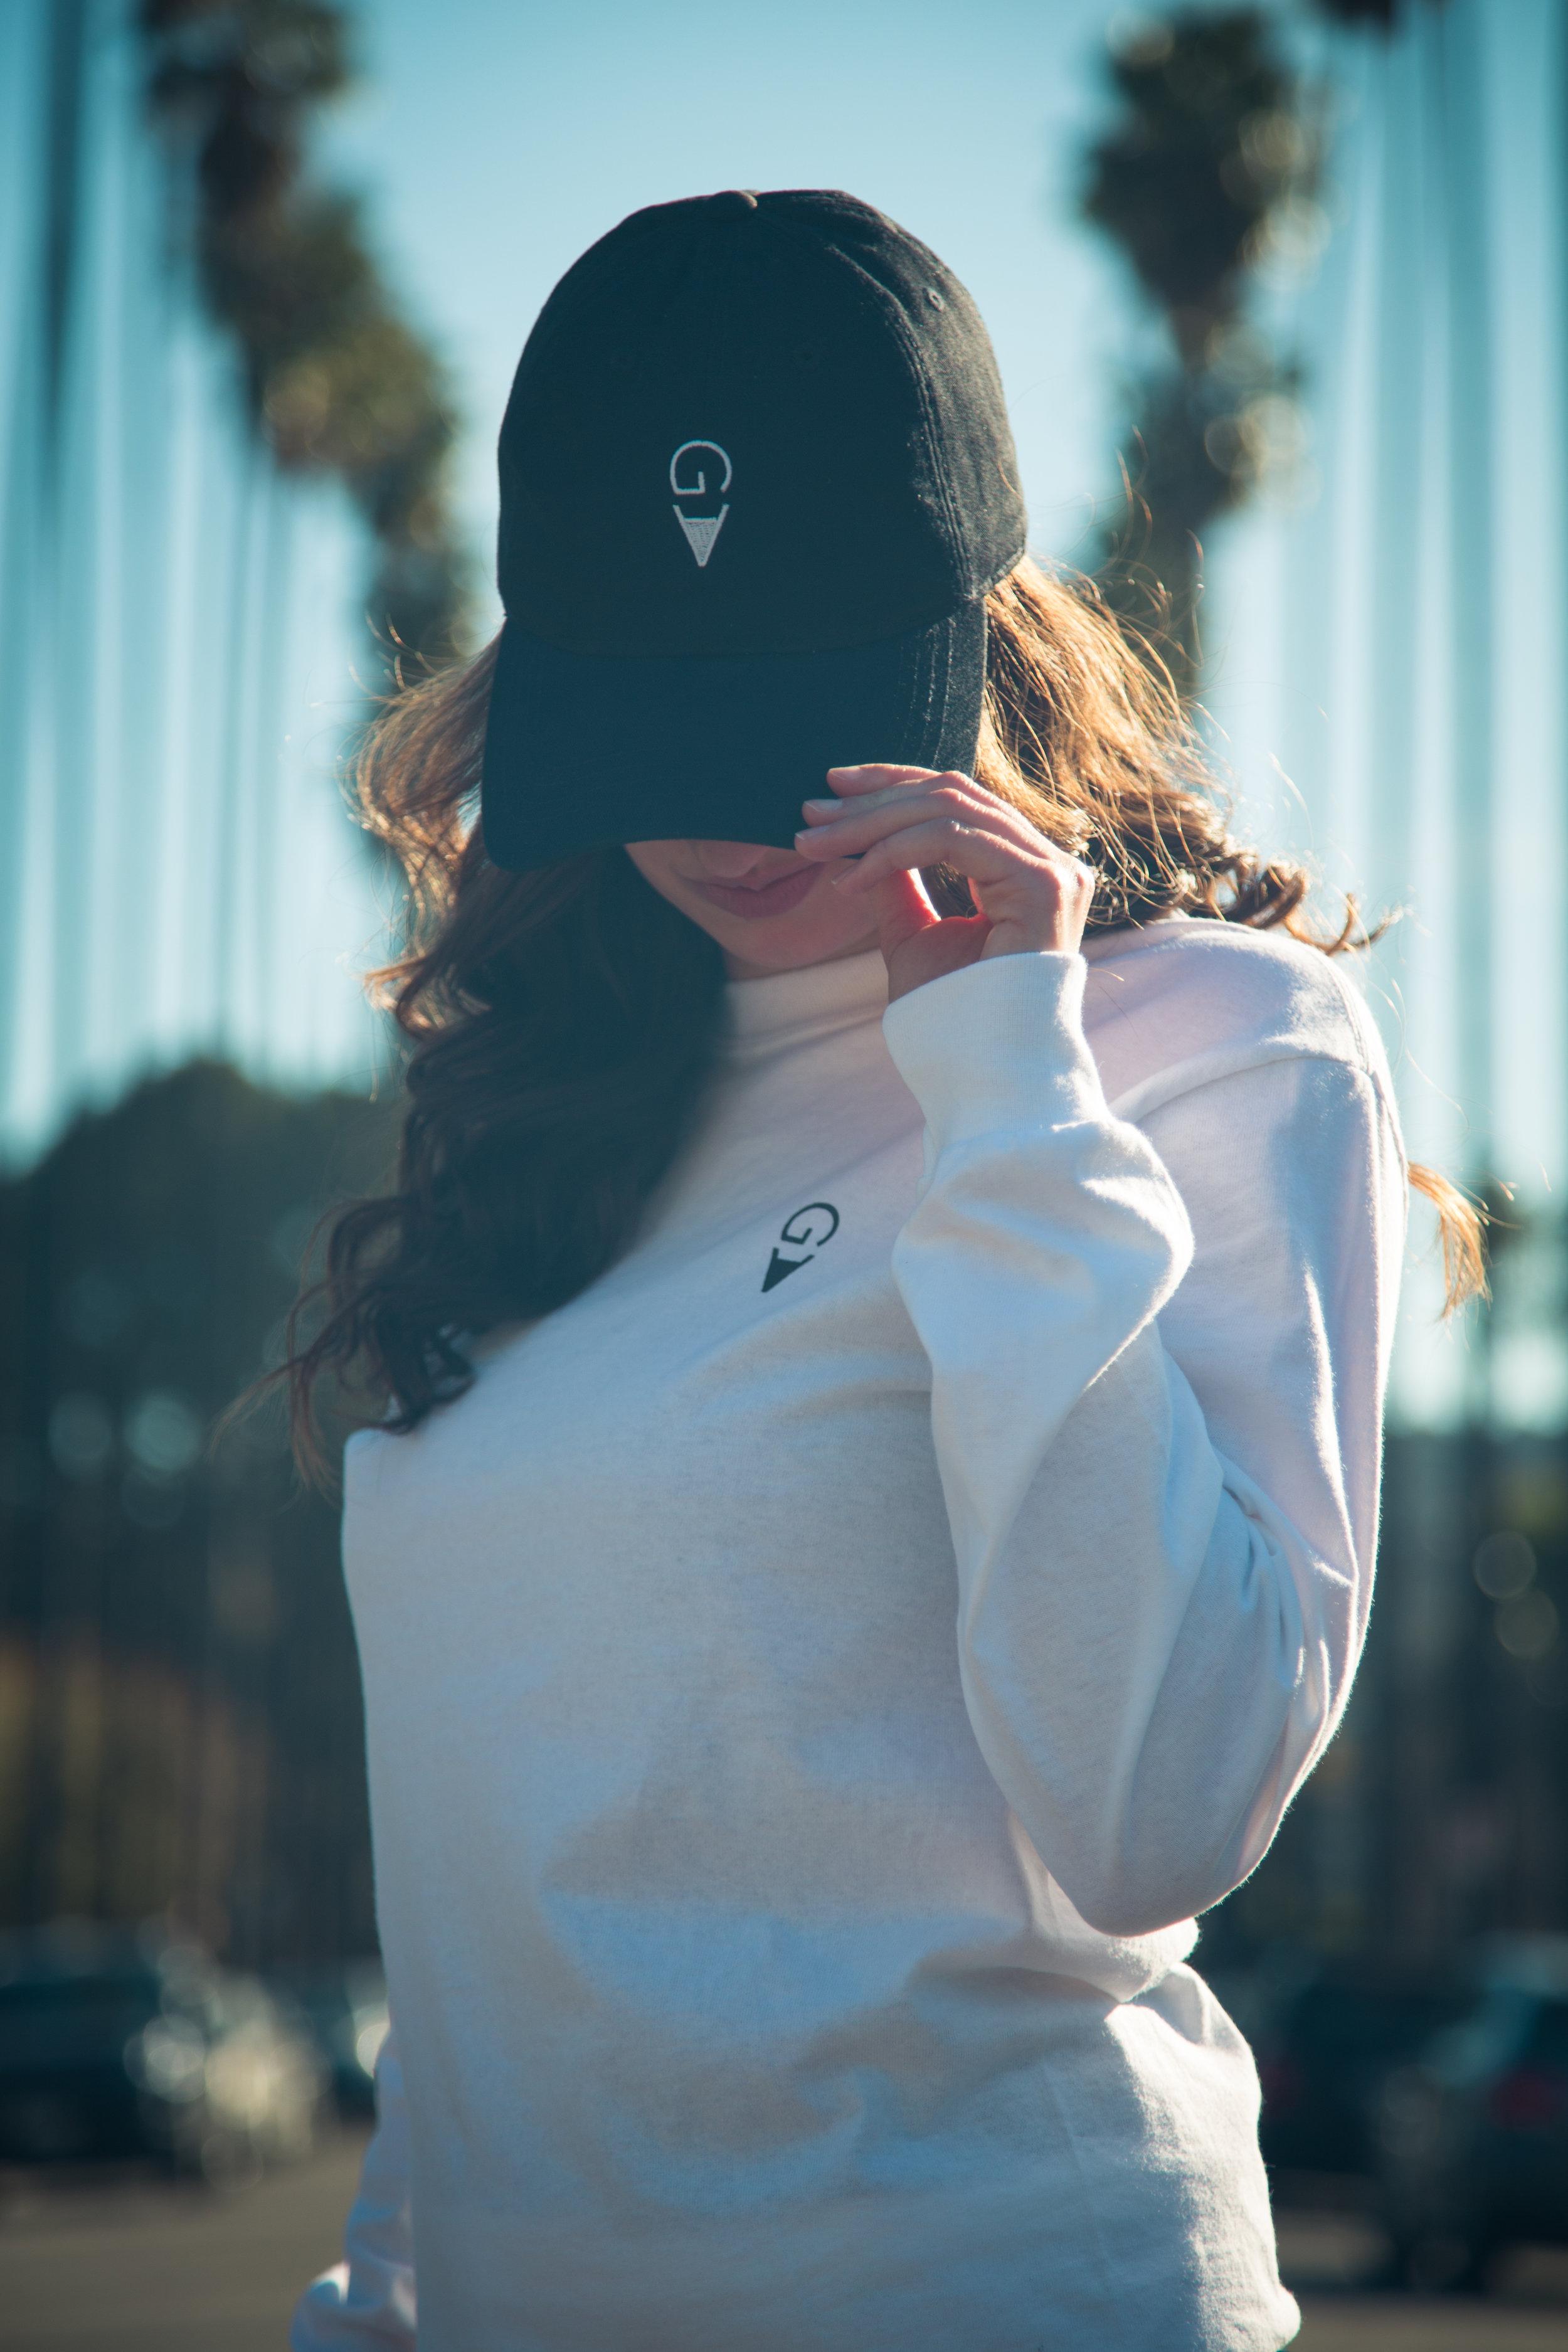 GS_clothing-2.jpg